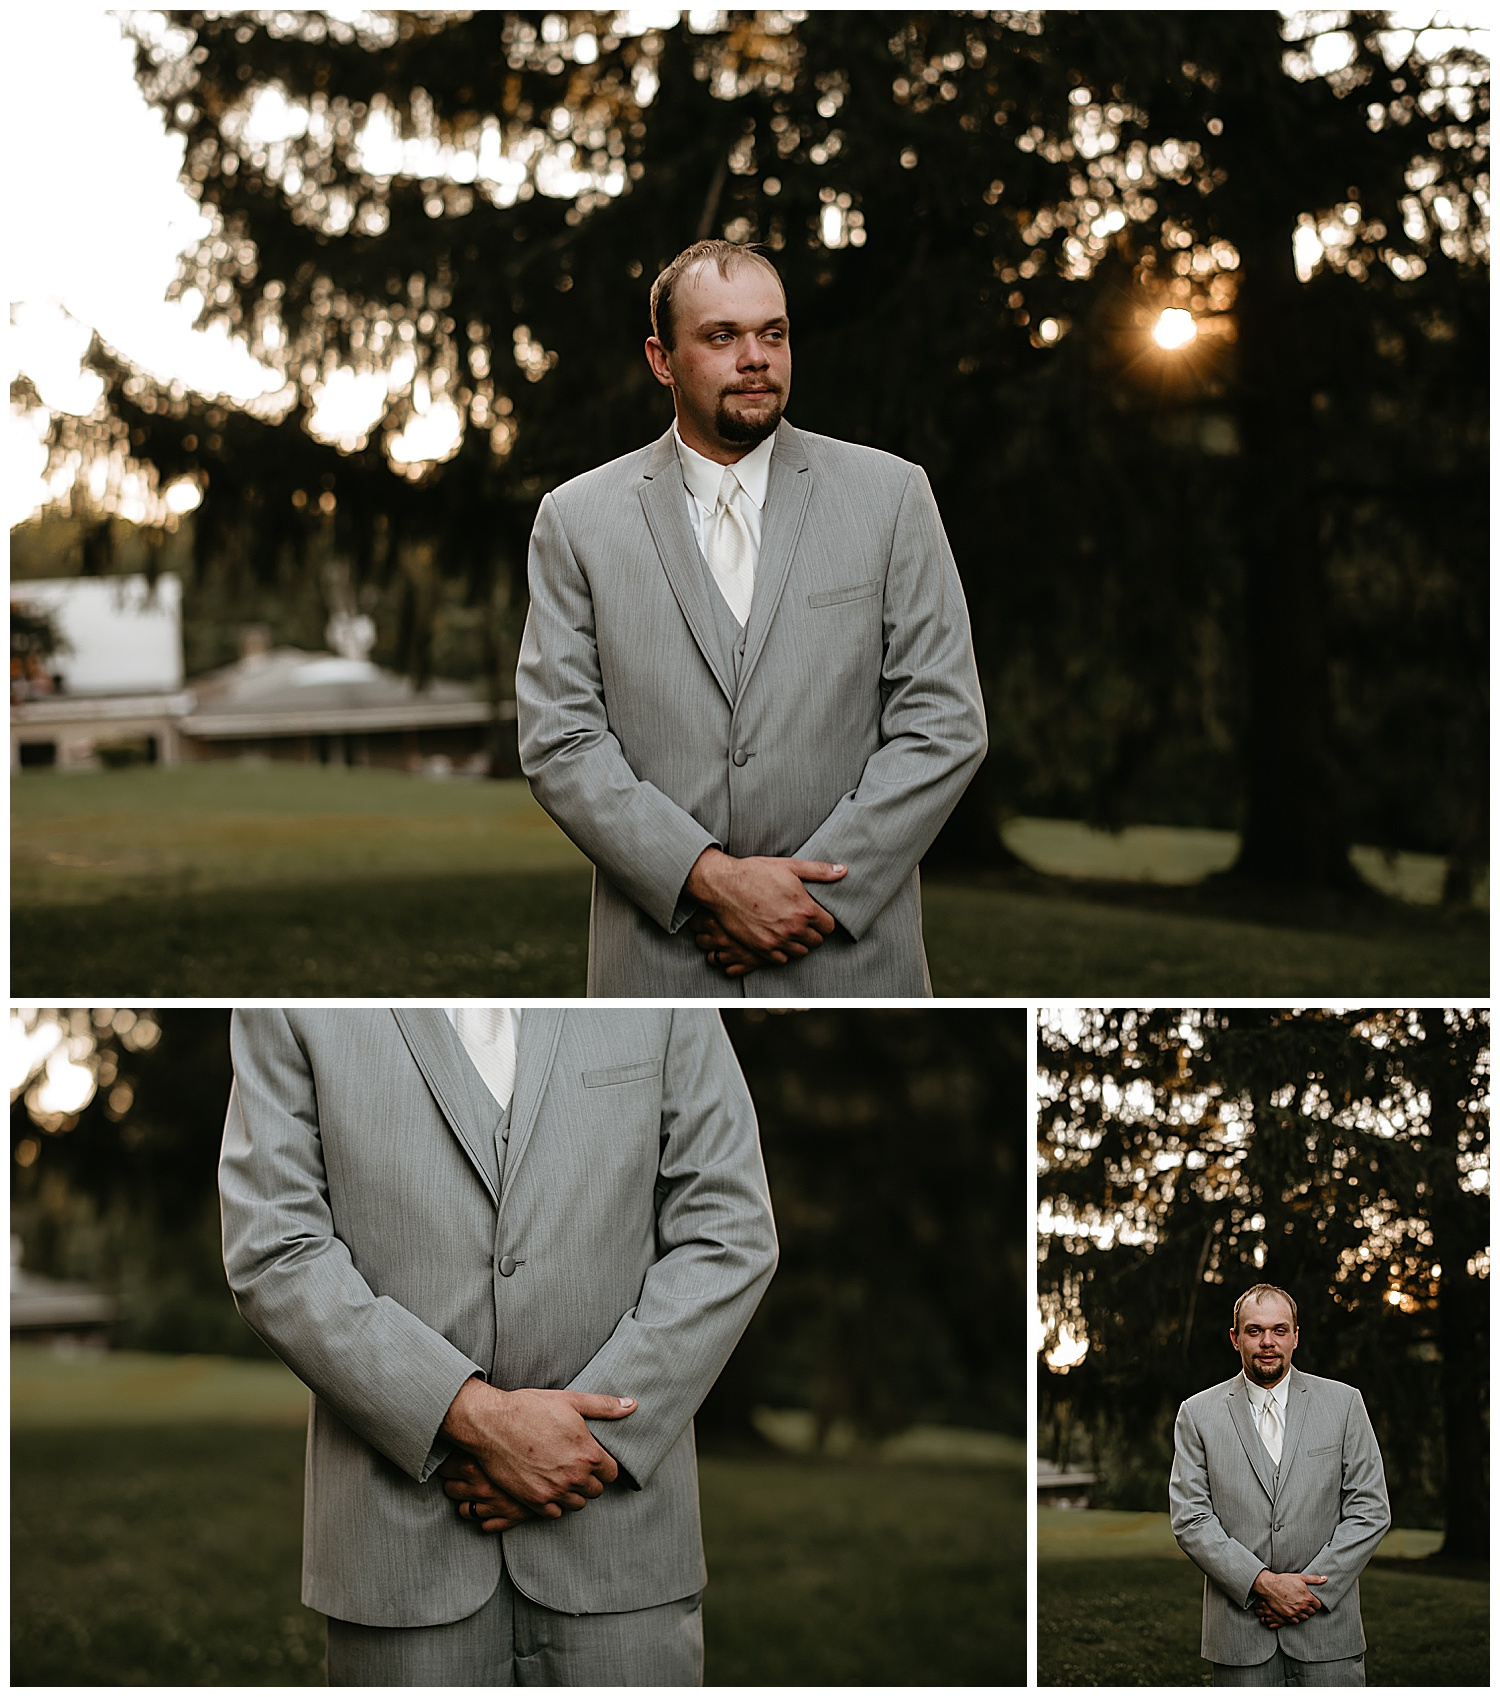 NEPA-Lehigh-Valley-Wedding-Photographer-at-Fountain-Springs-Country-Inn-Ashland-PA_0064.jpg